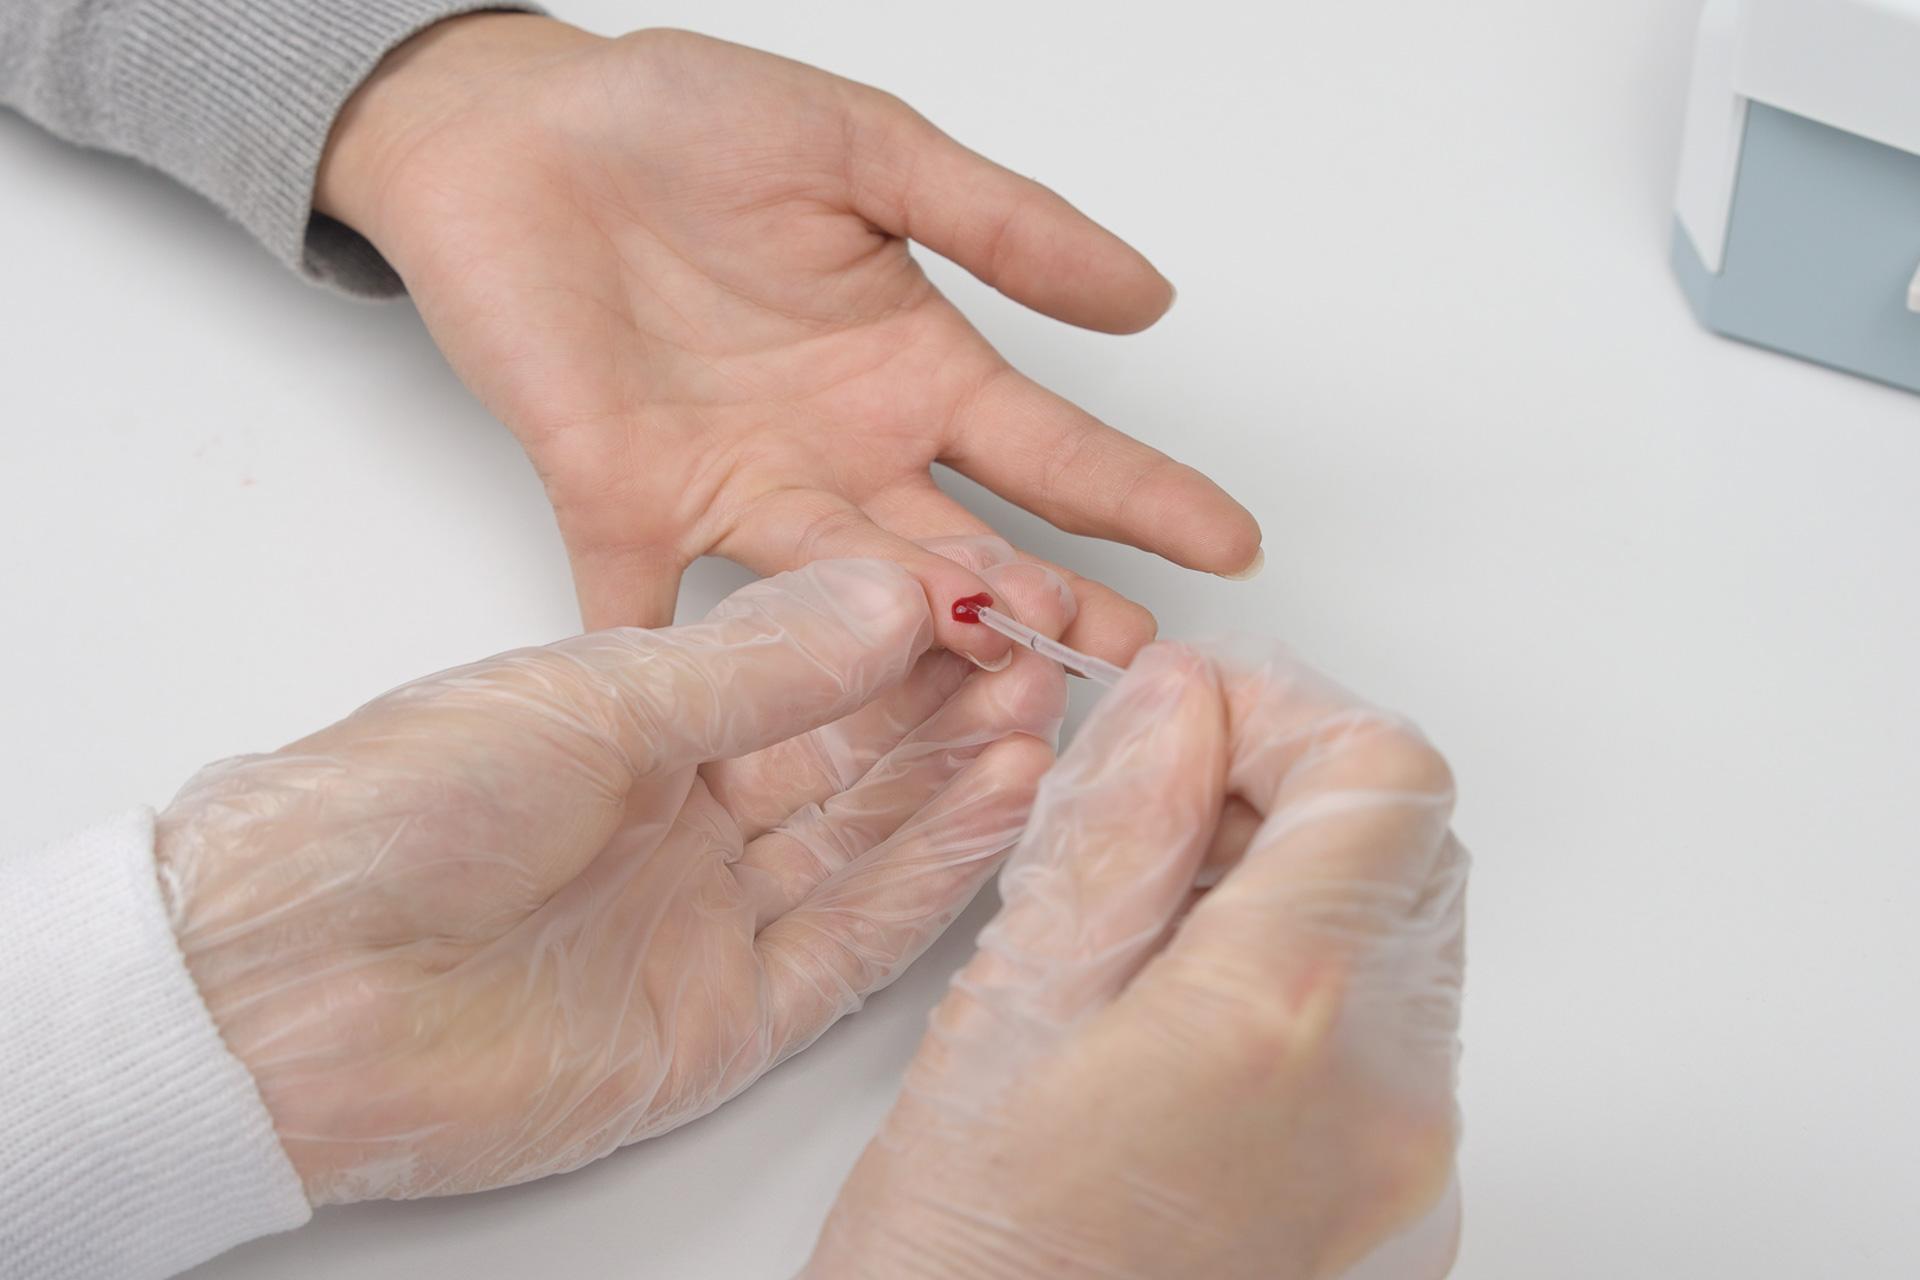 bm Finecare Blut aufnehmen 2.3.1